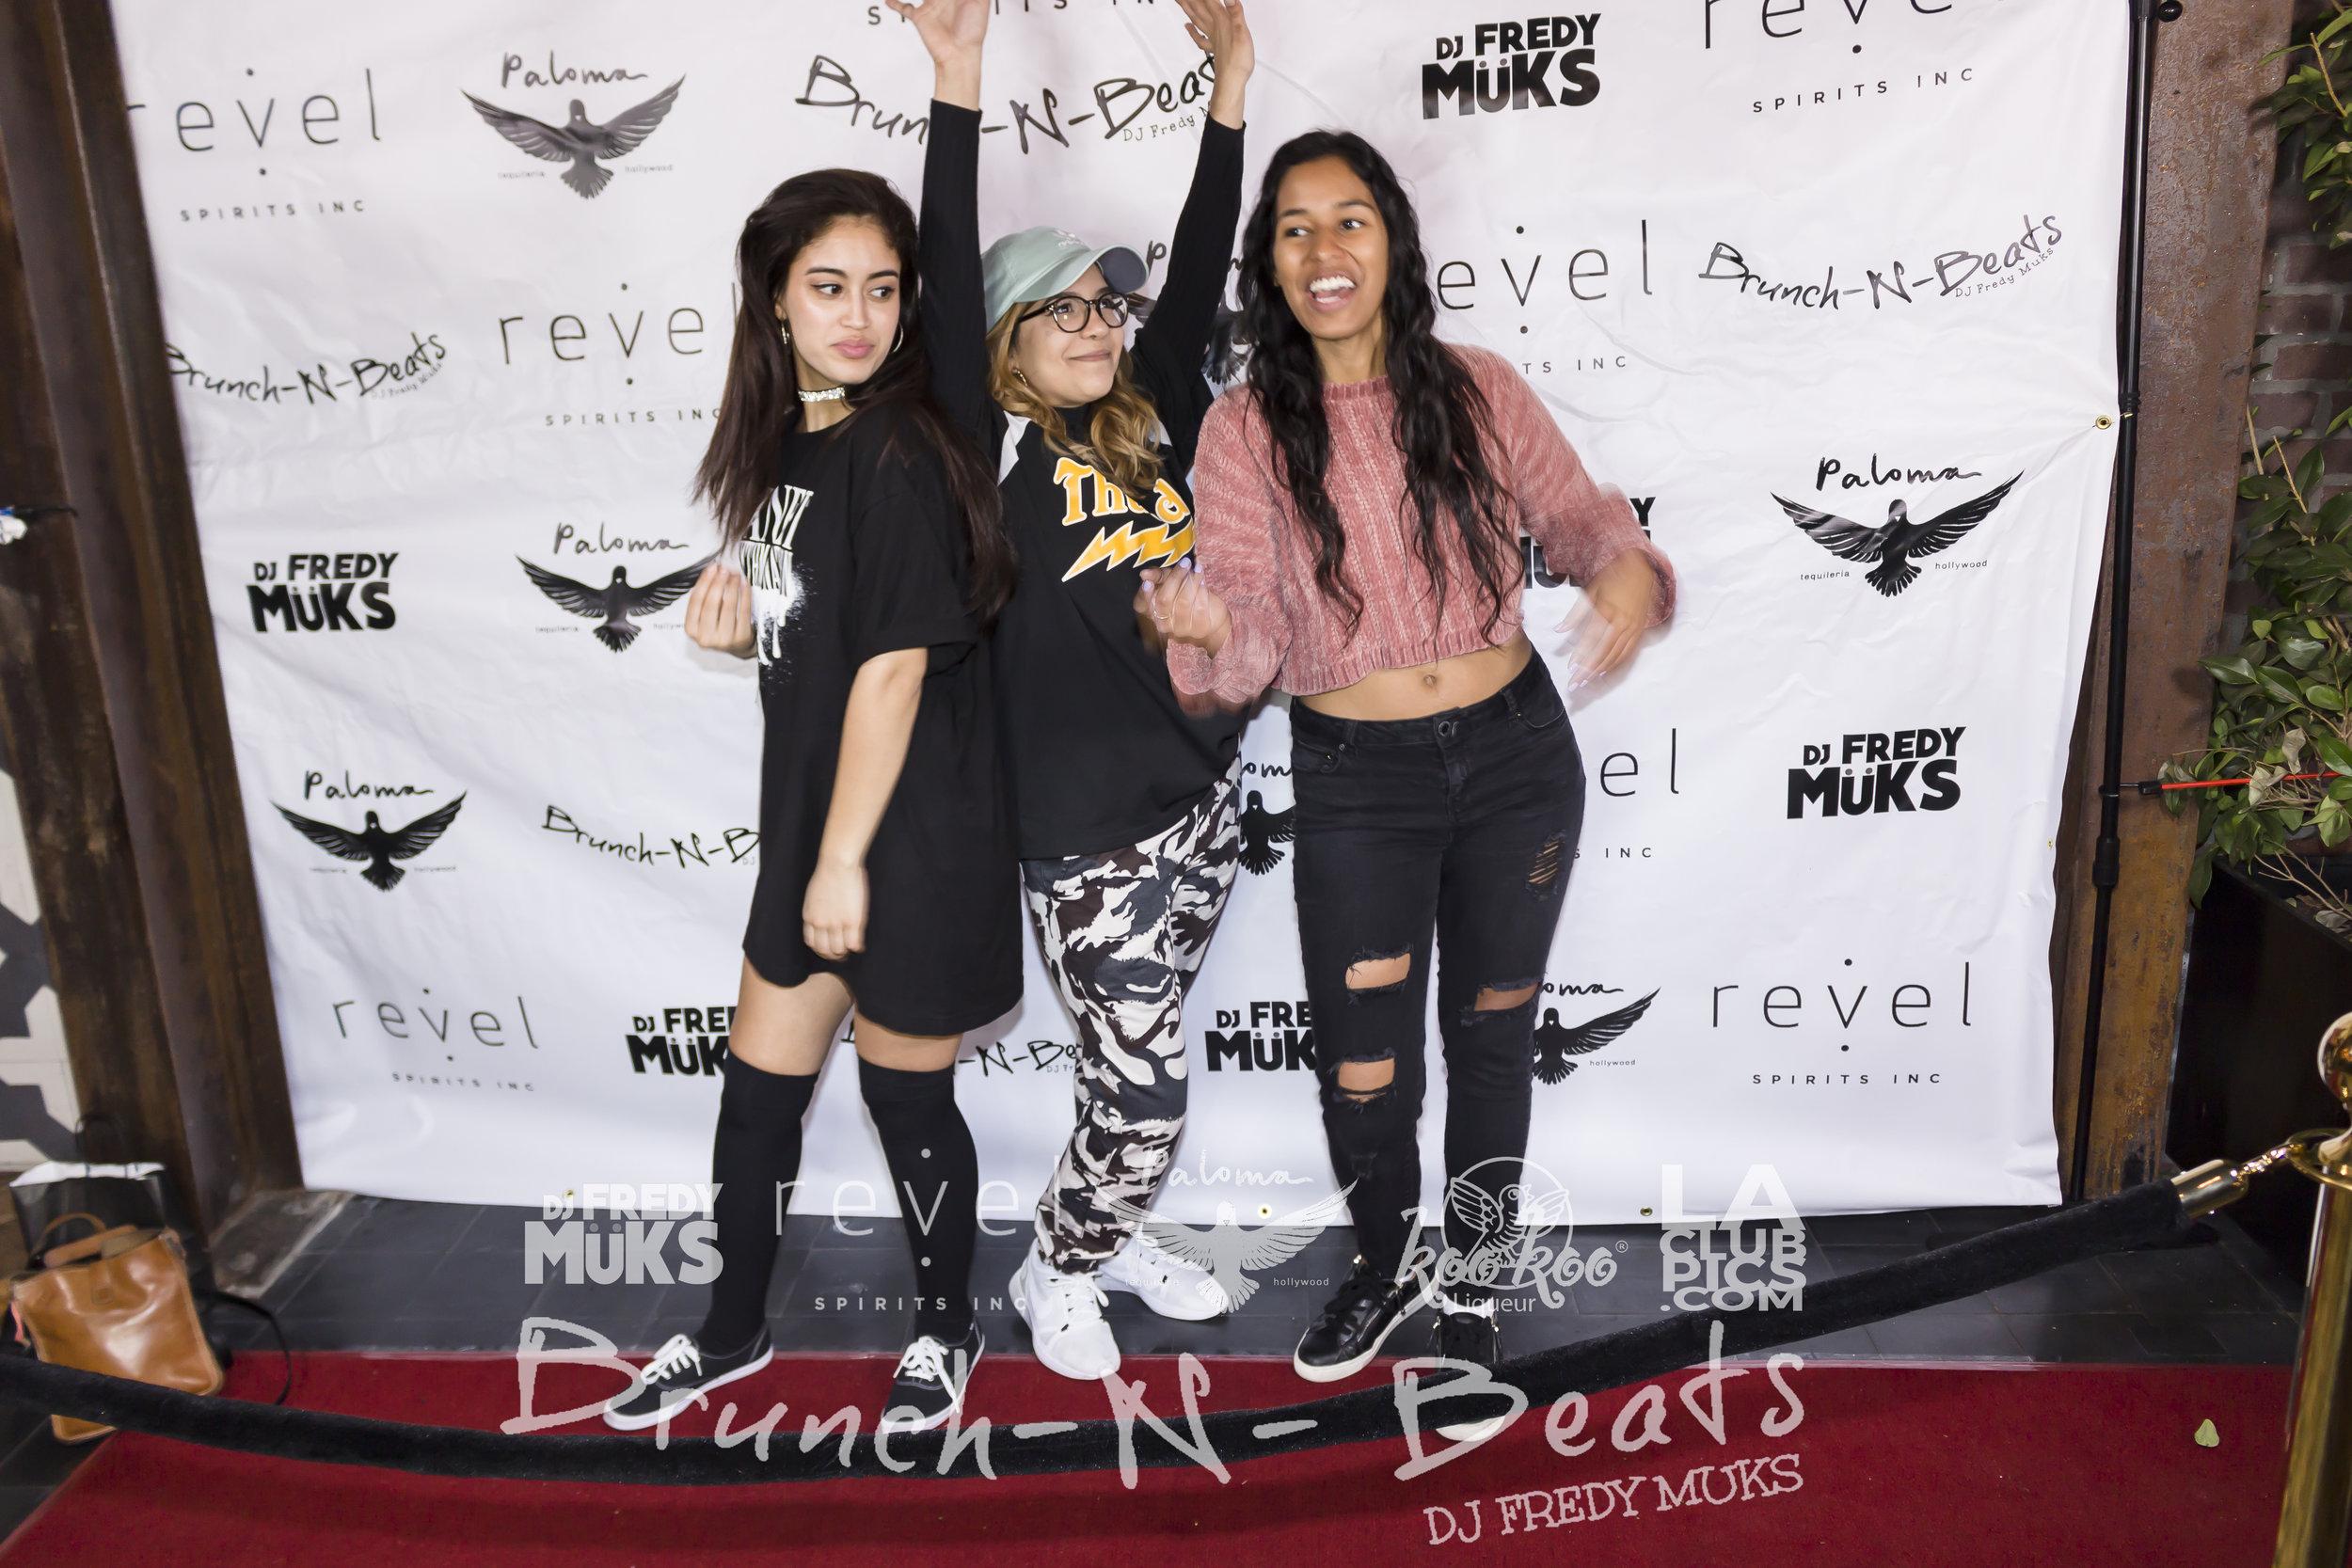 Brunch-N-Beats - 03-11-18_5.jpg